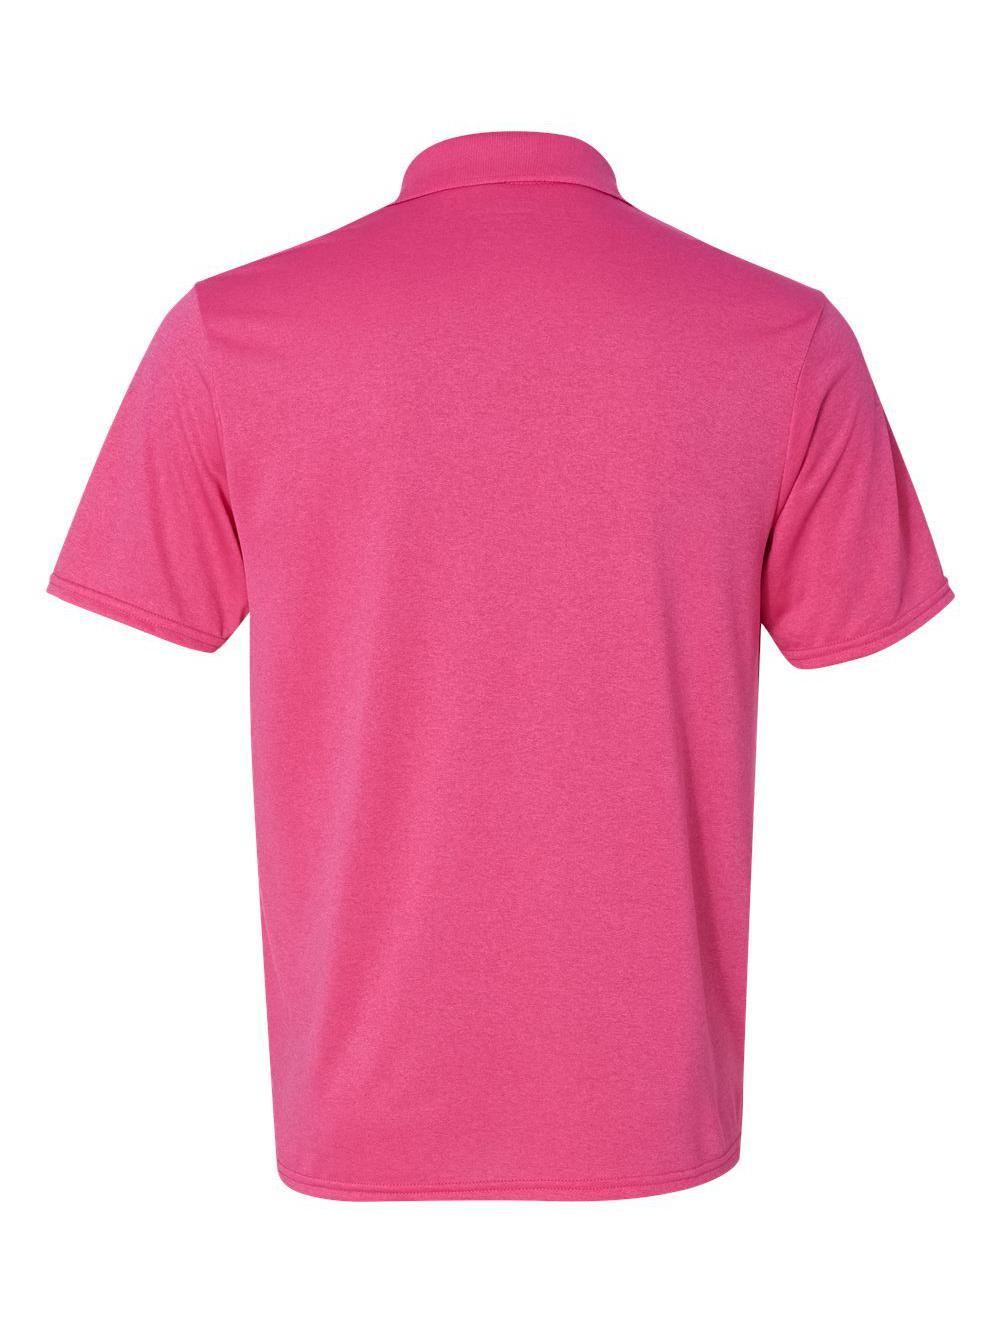 Gildan-Performance-Jersey-Sport-Shirt-44800 thumbnail 13